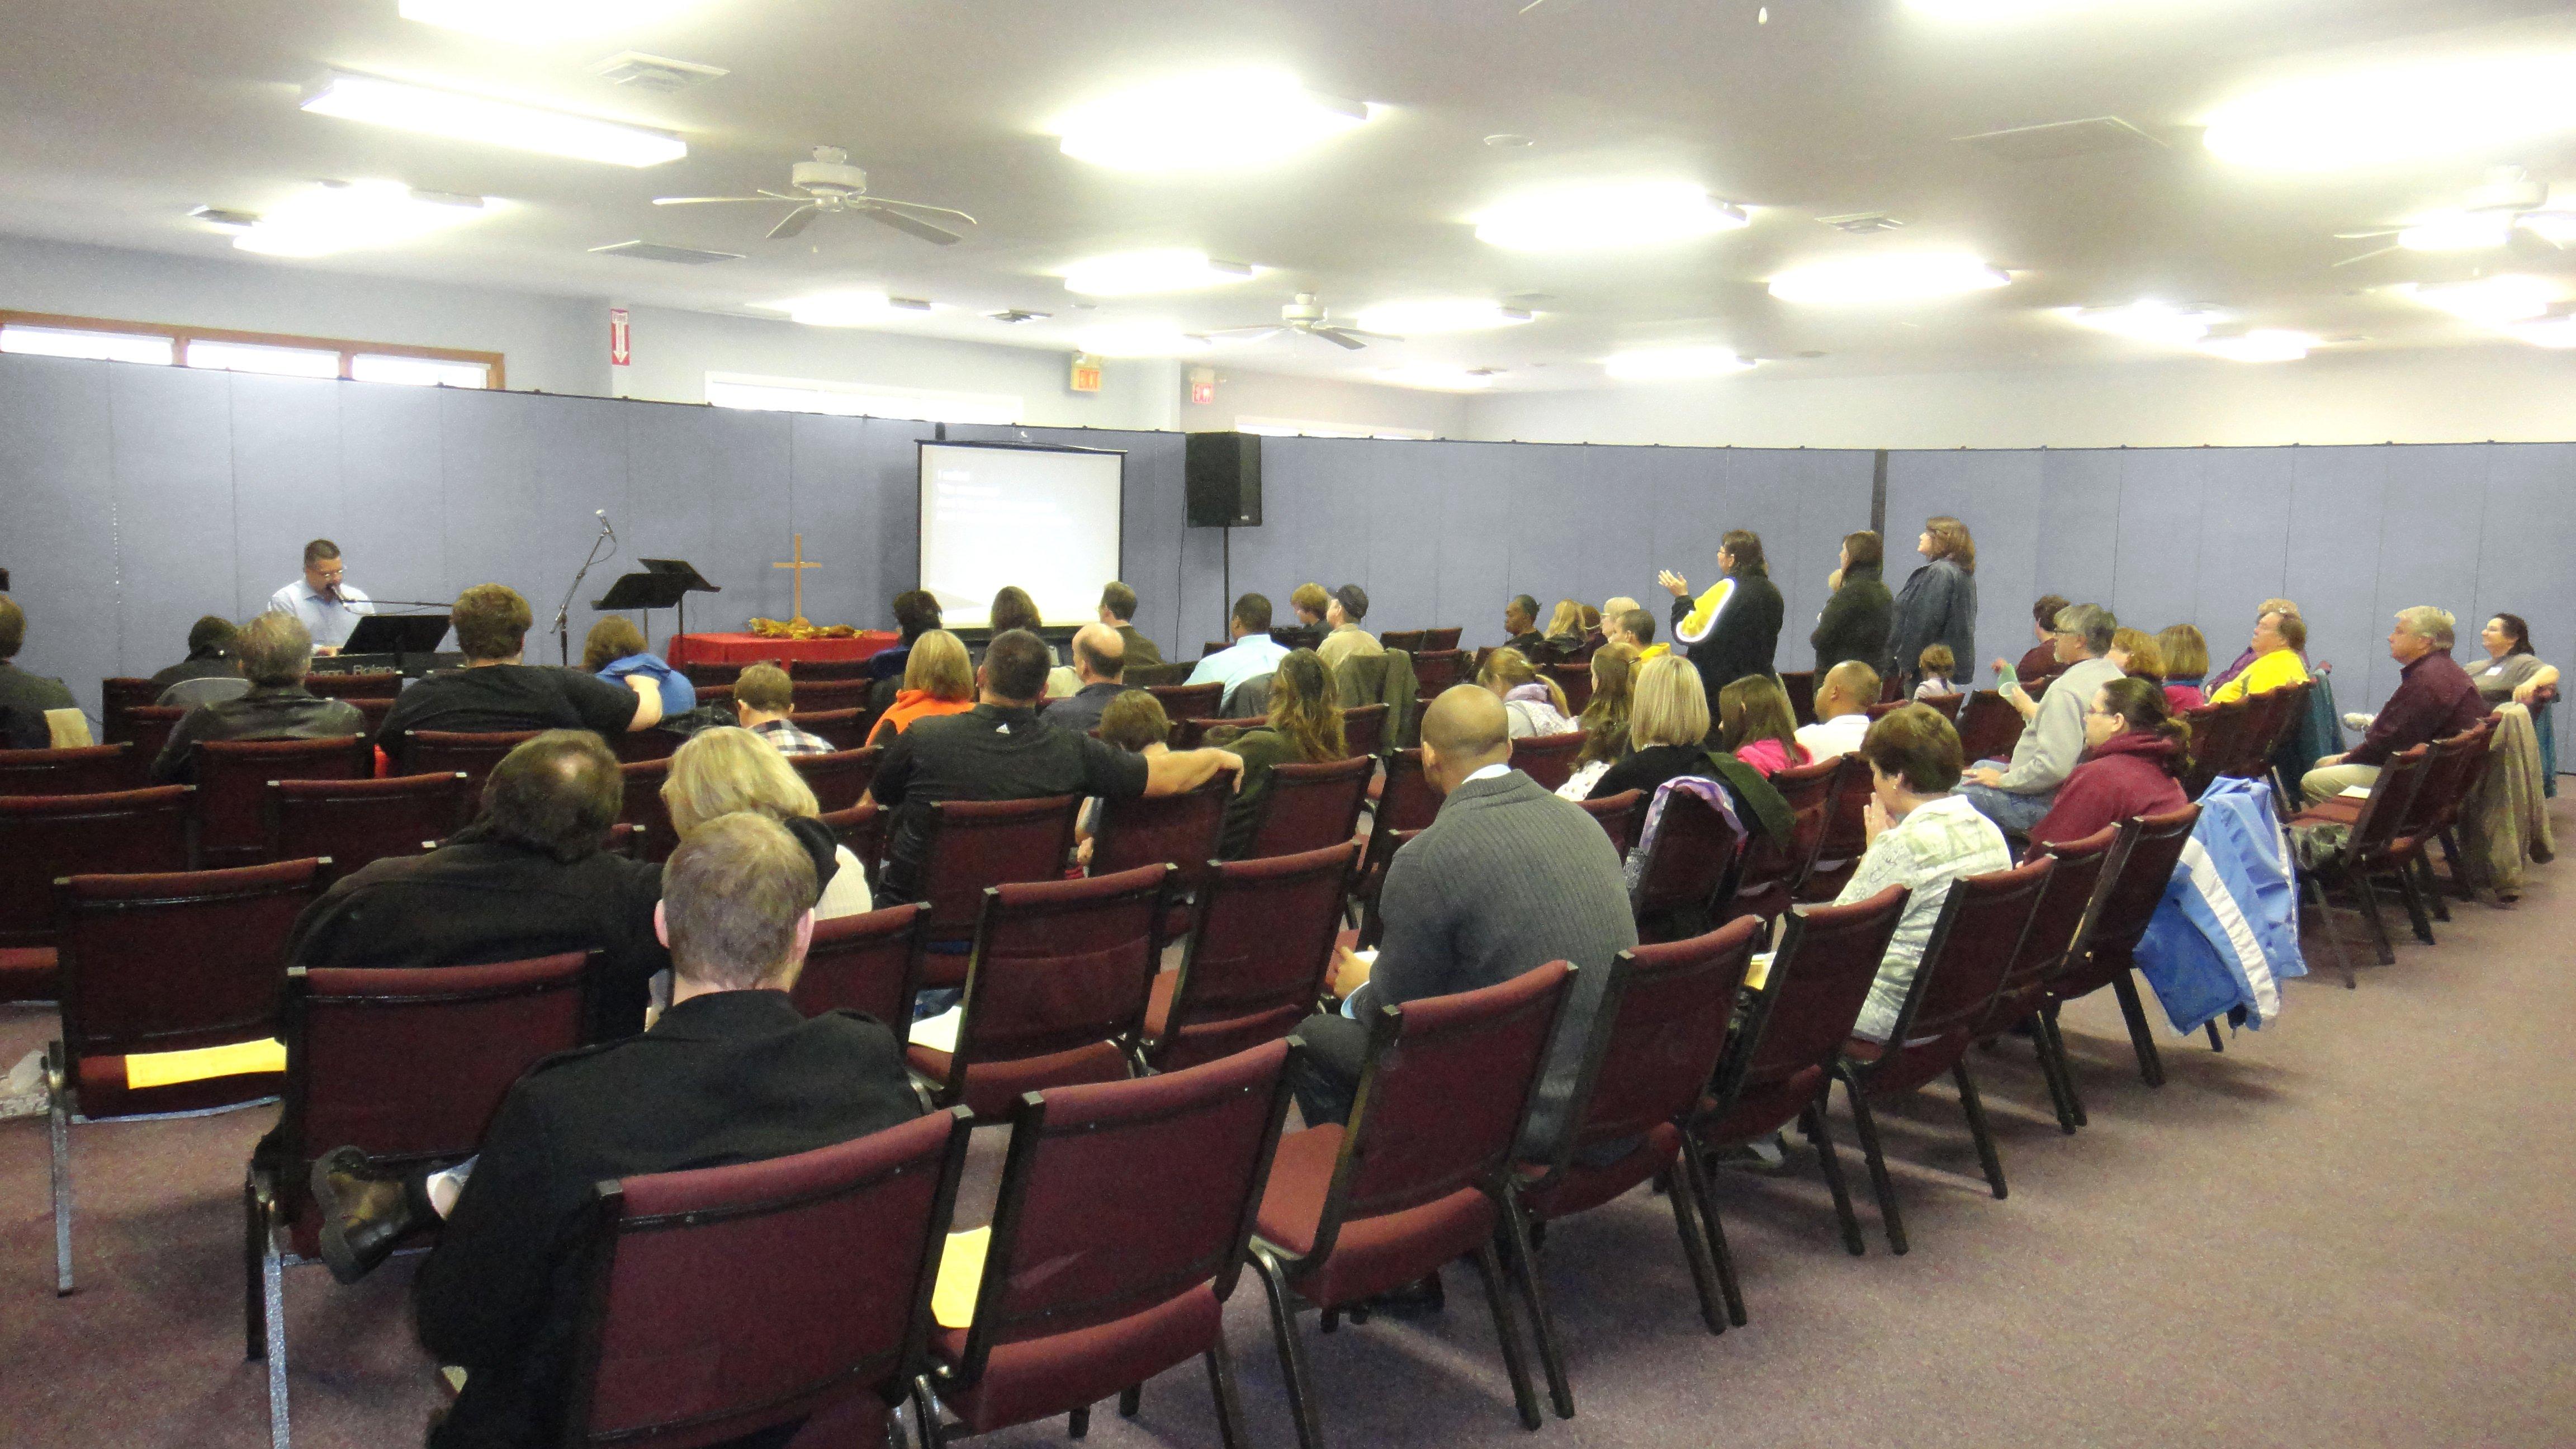 Worship service at Vineyard Church